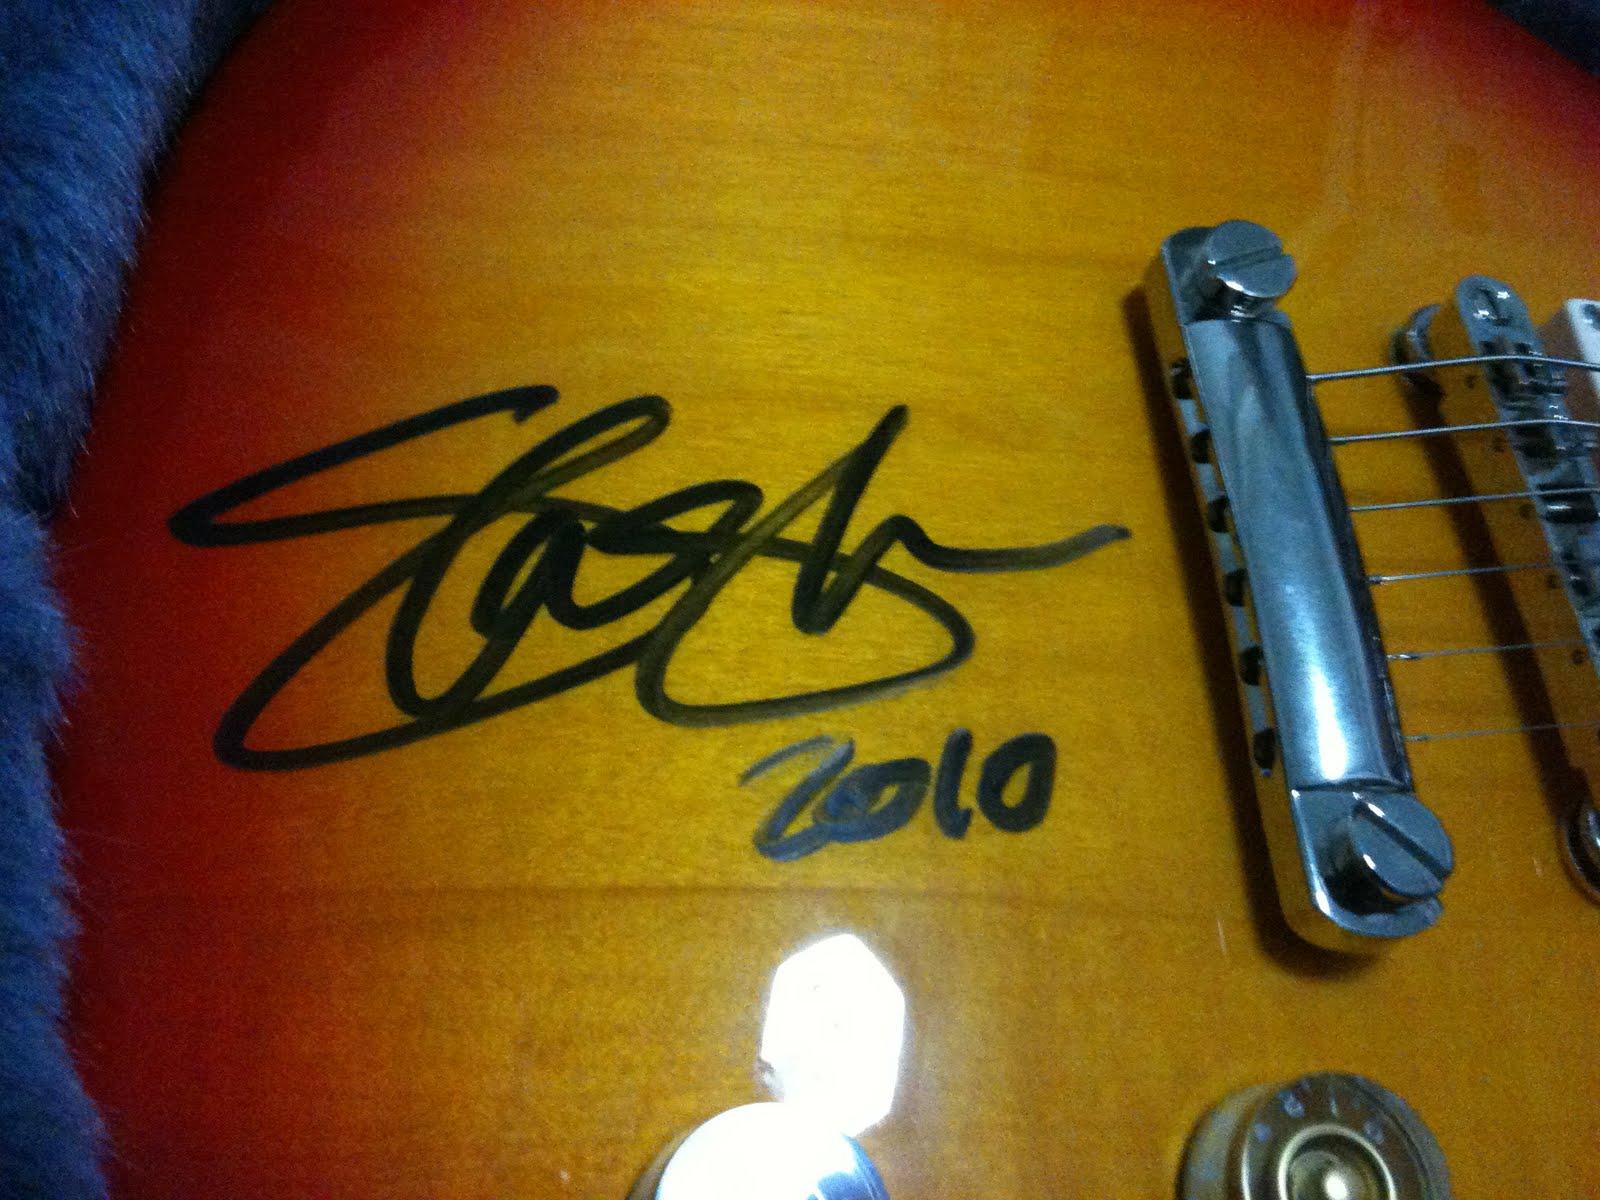 slash meet and greet 2012